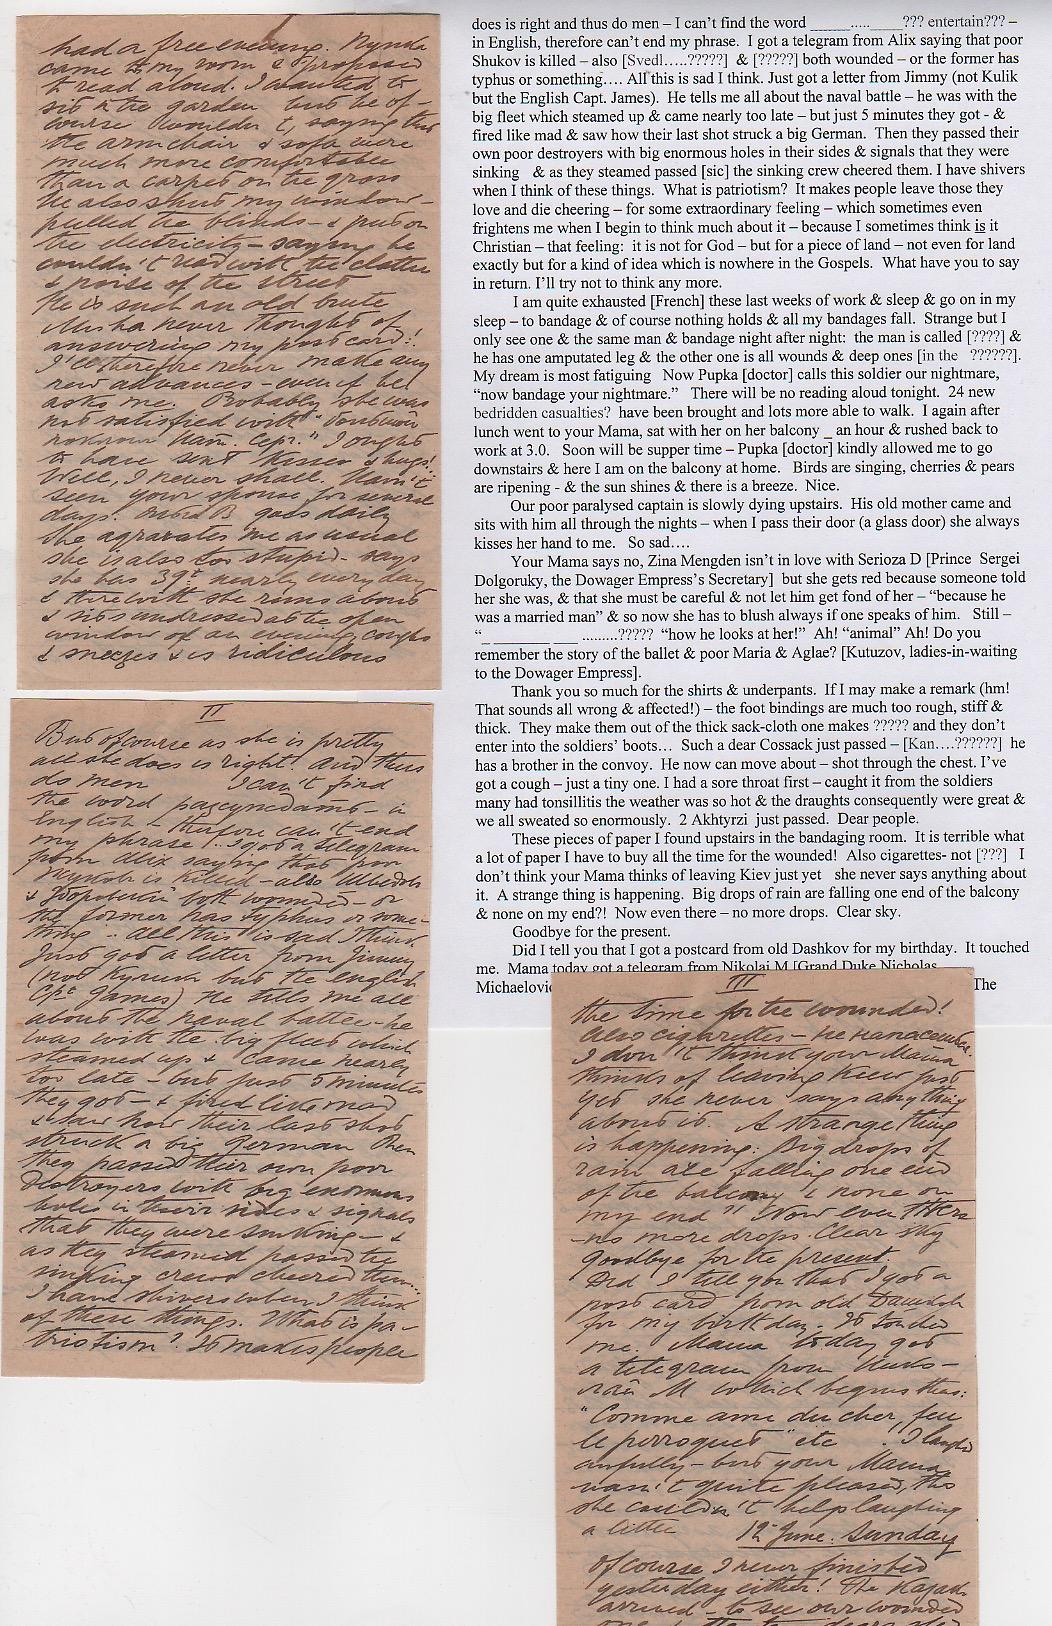 Royalty Grand Duchess Olga Correspondence To Her Sister Grand Duchess Xenia 1916-1920 - Image 39 of 47